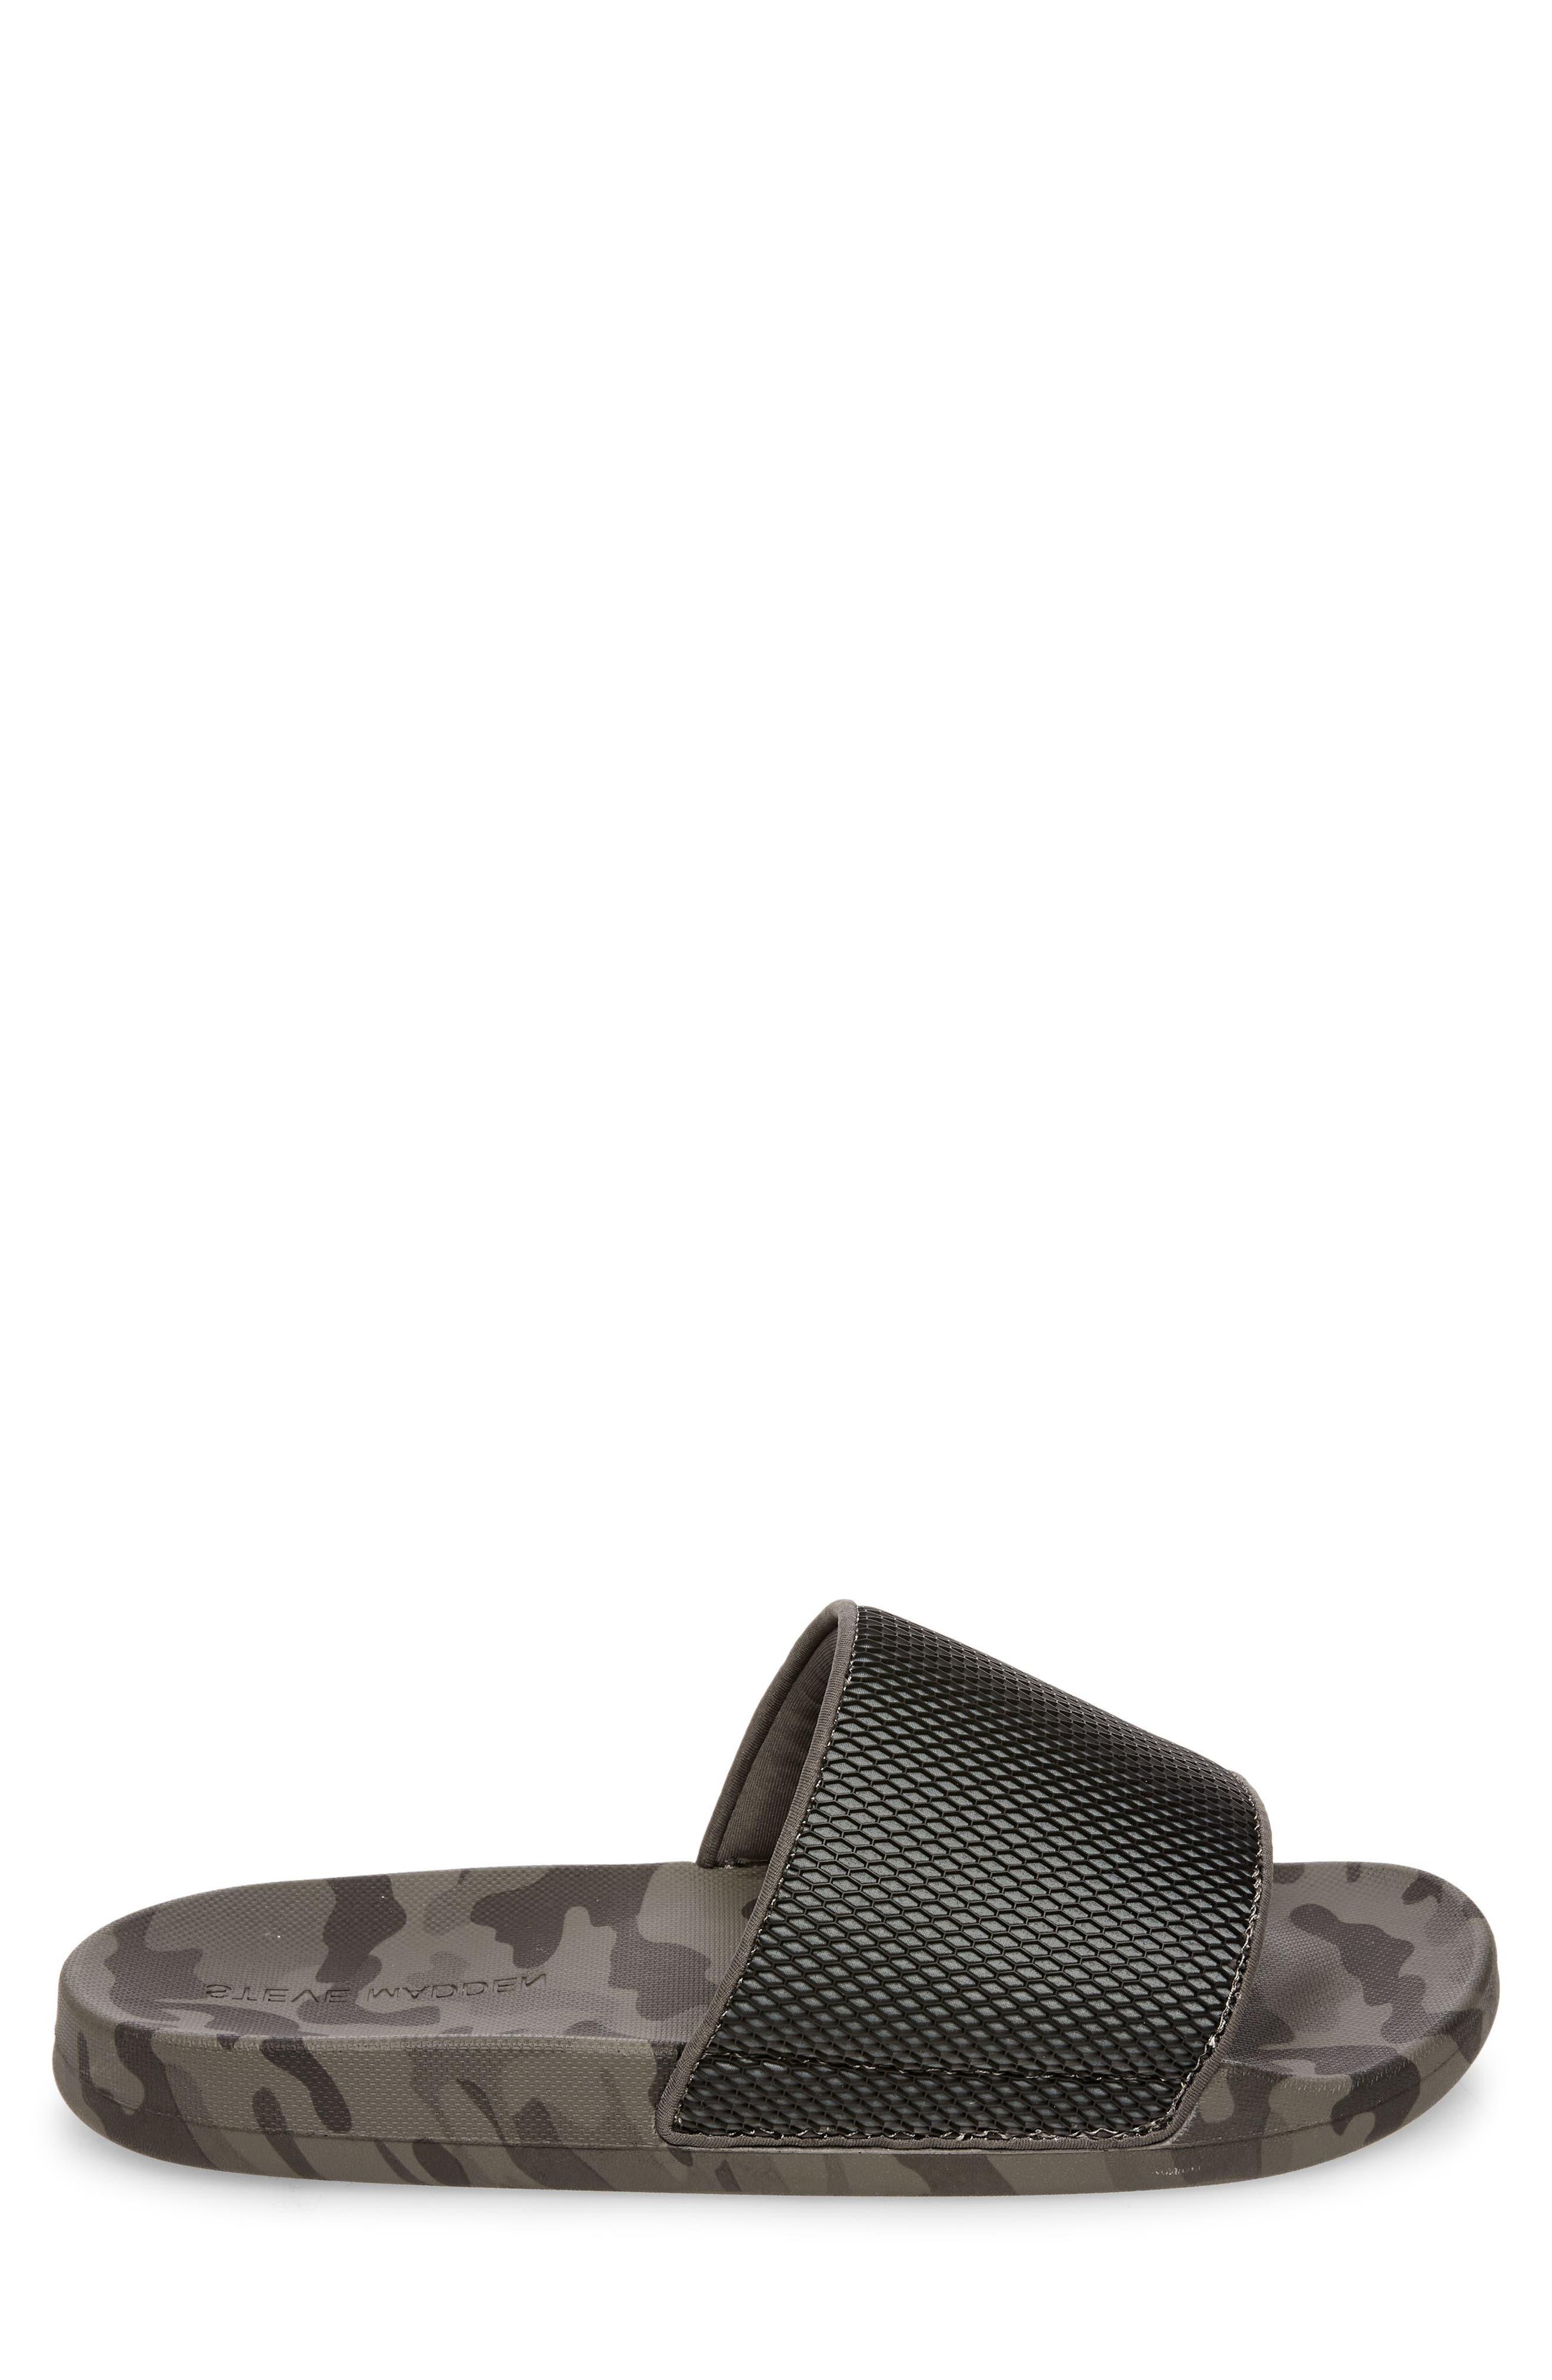 Seabees Textured Slide Sandal,                             Alternate thumbnail 3, color,                             Grey Camo